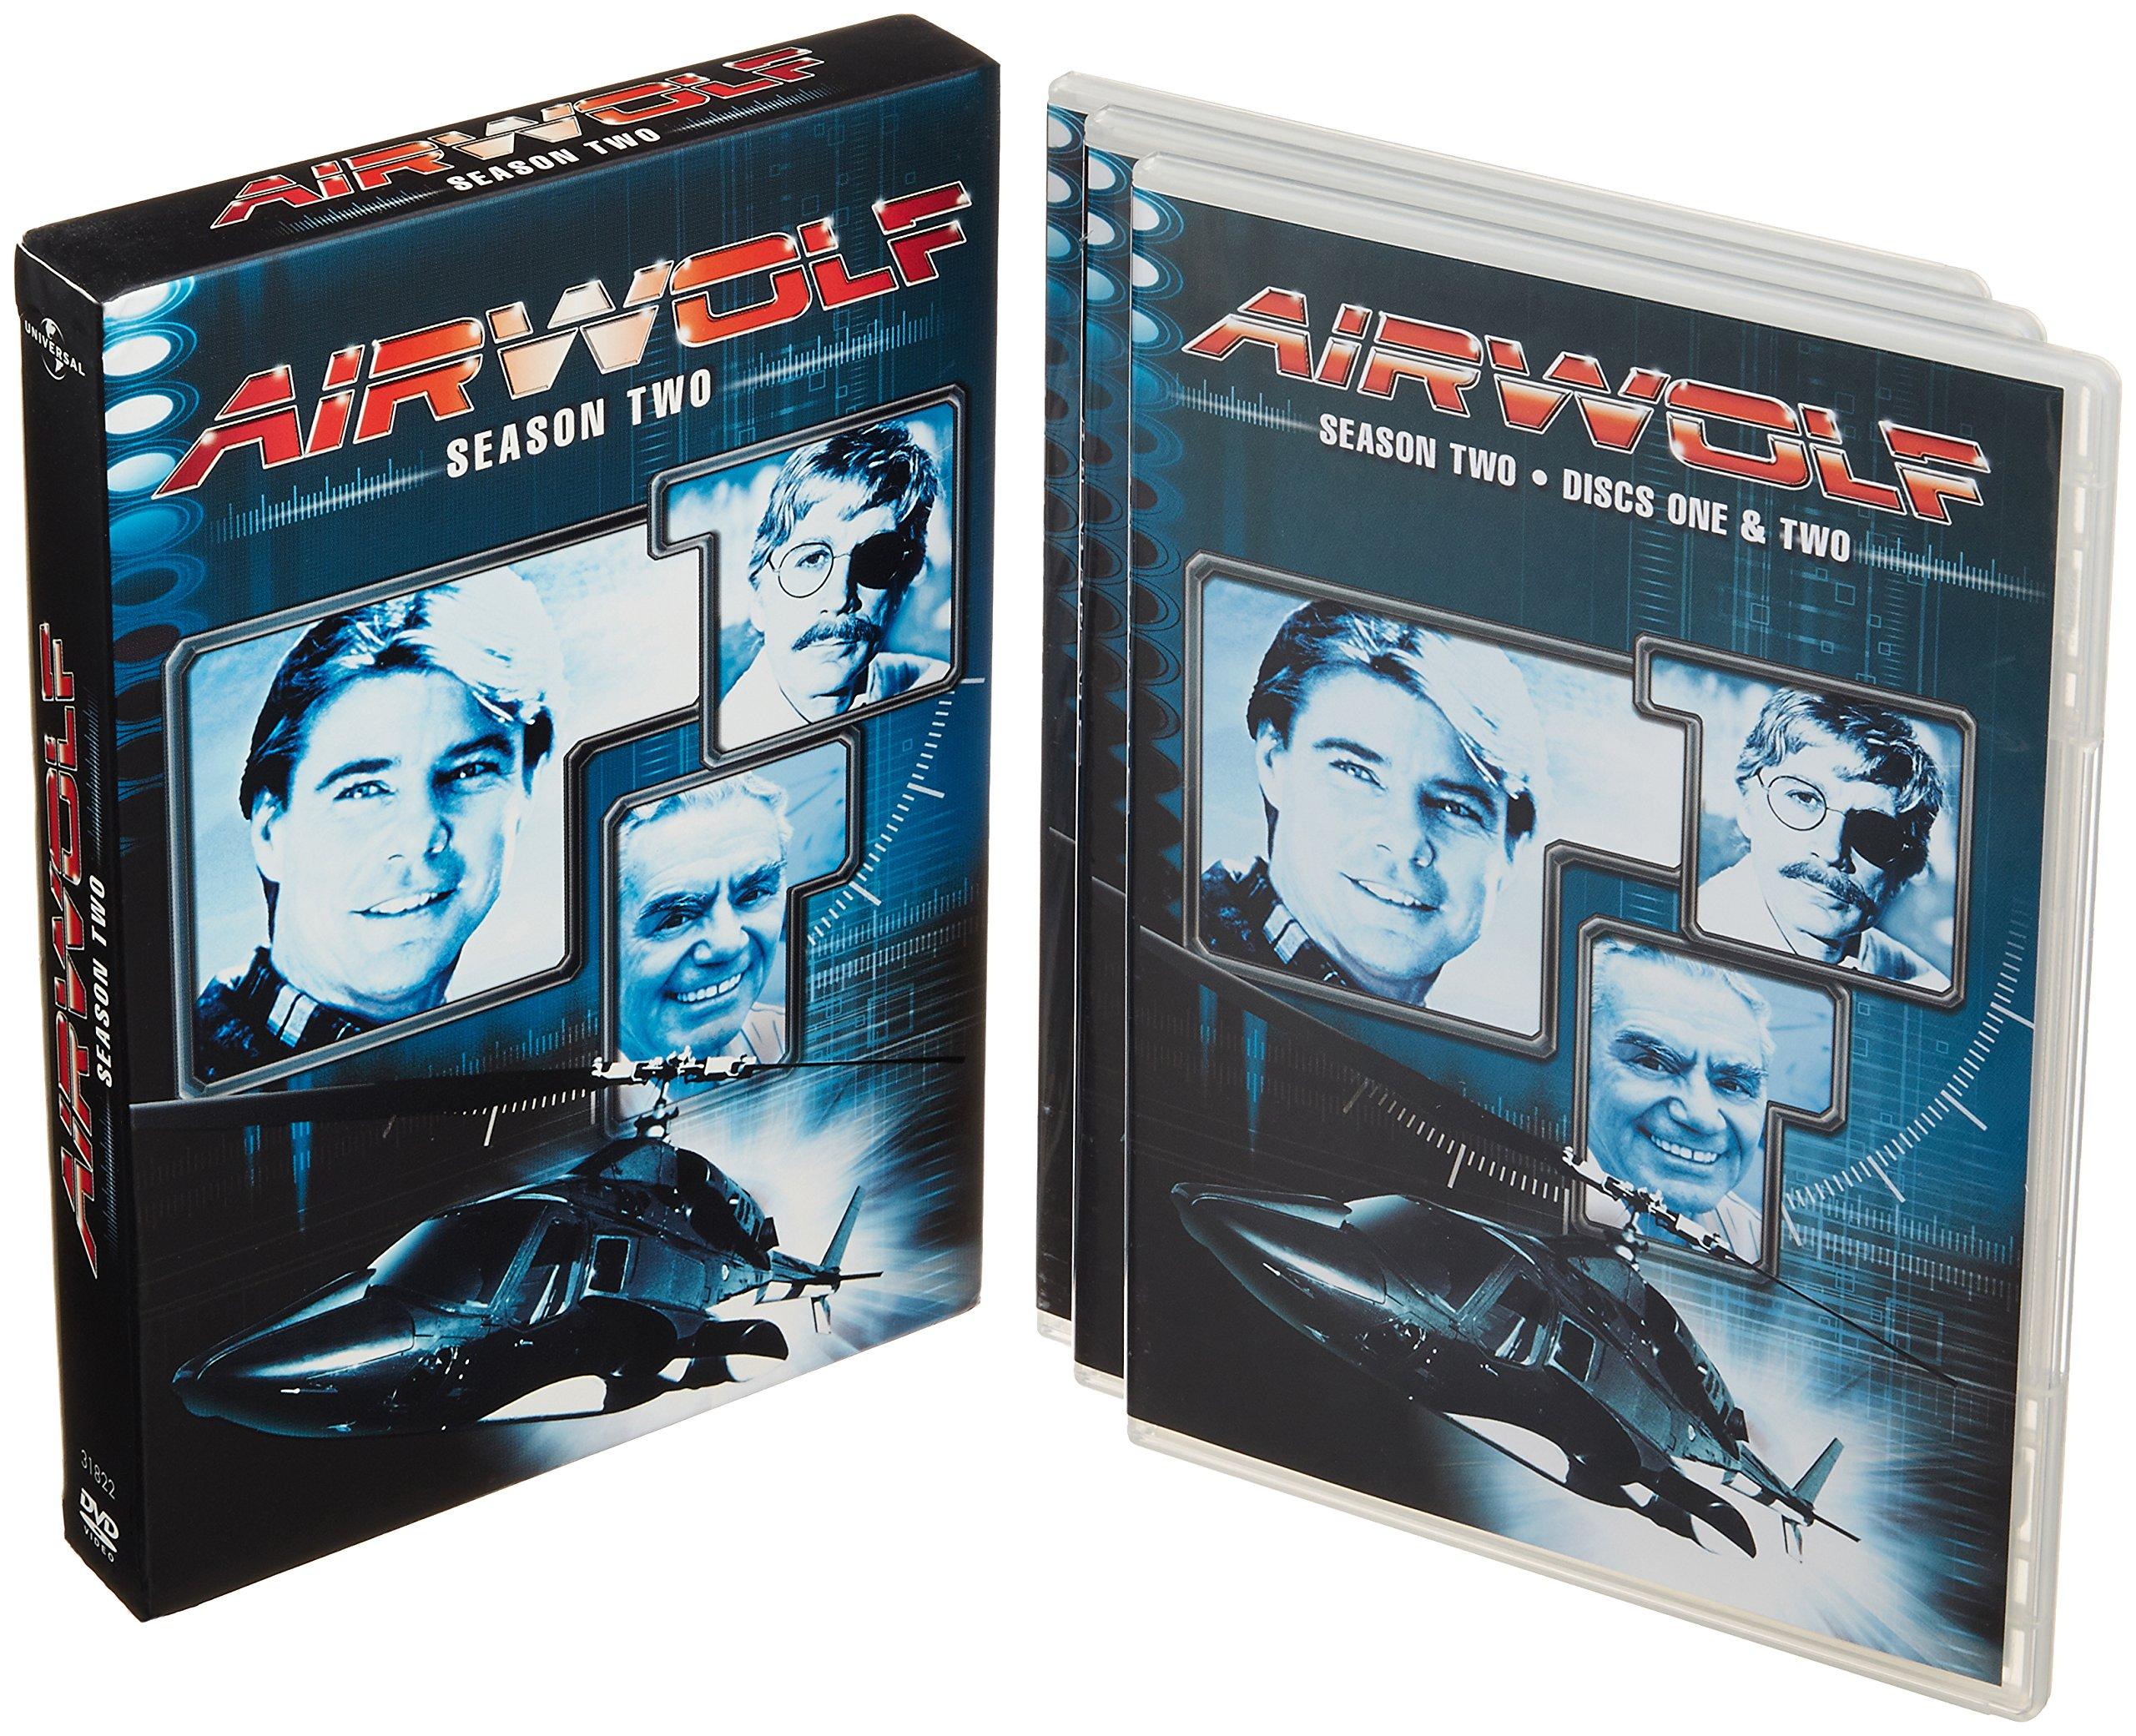 DVD : Airwolf: Season Two (Full Frame, Dolby, , Digipack Packaging, Slipsleeve Packaging)